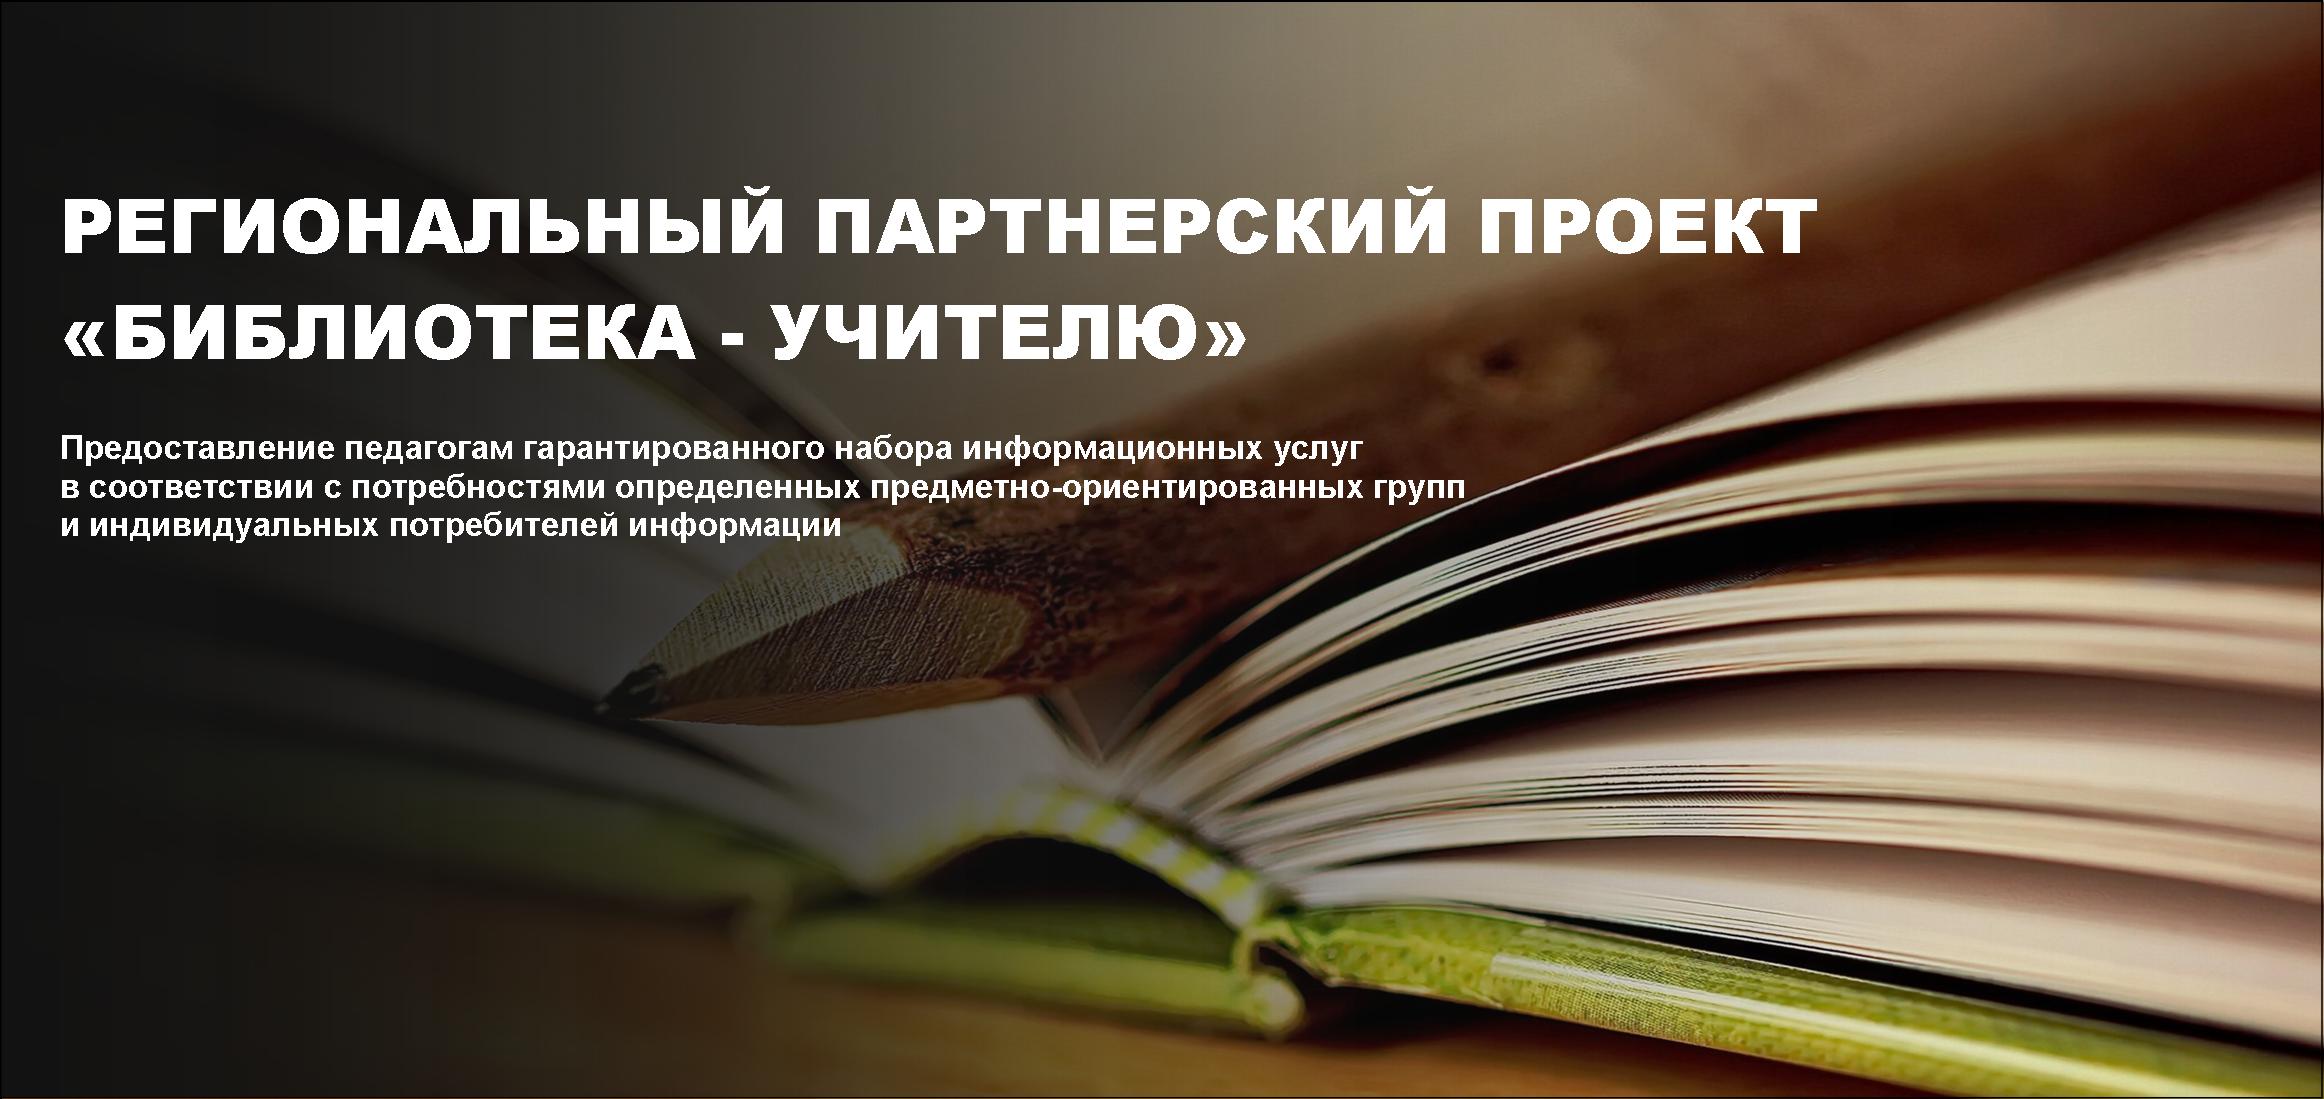 Библиотека - учителю